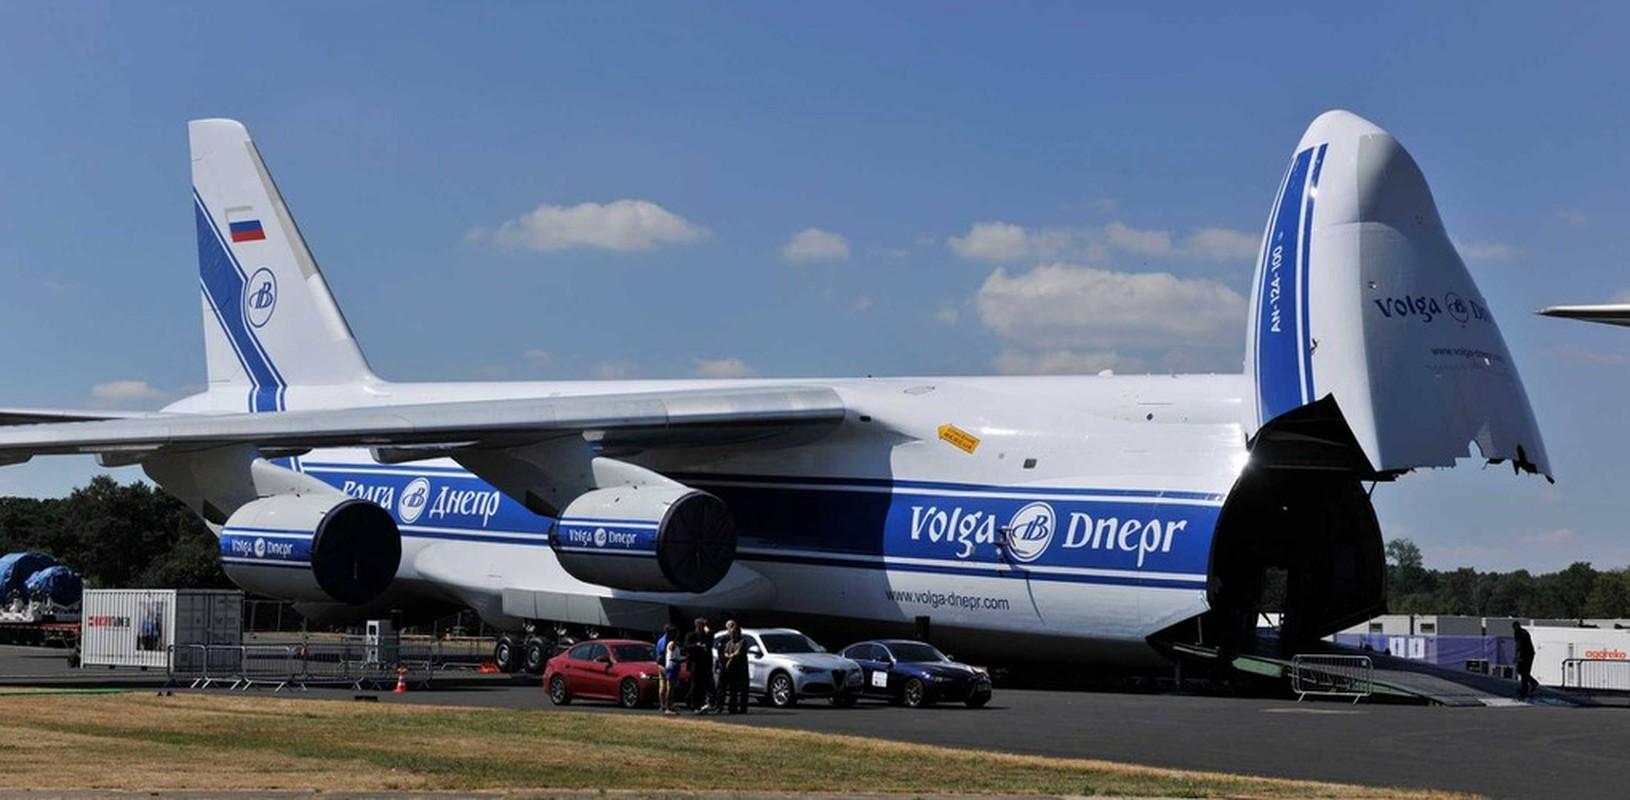 Nga kho khan khi nang cap may bay An-124 do cang thang voi Ukraine-Hinh-5